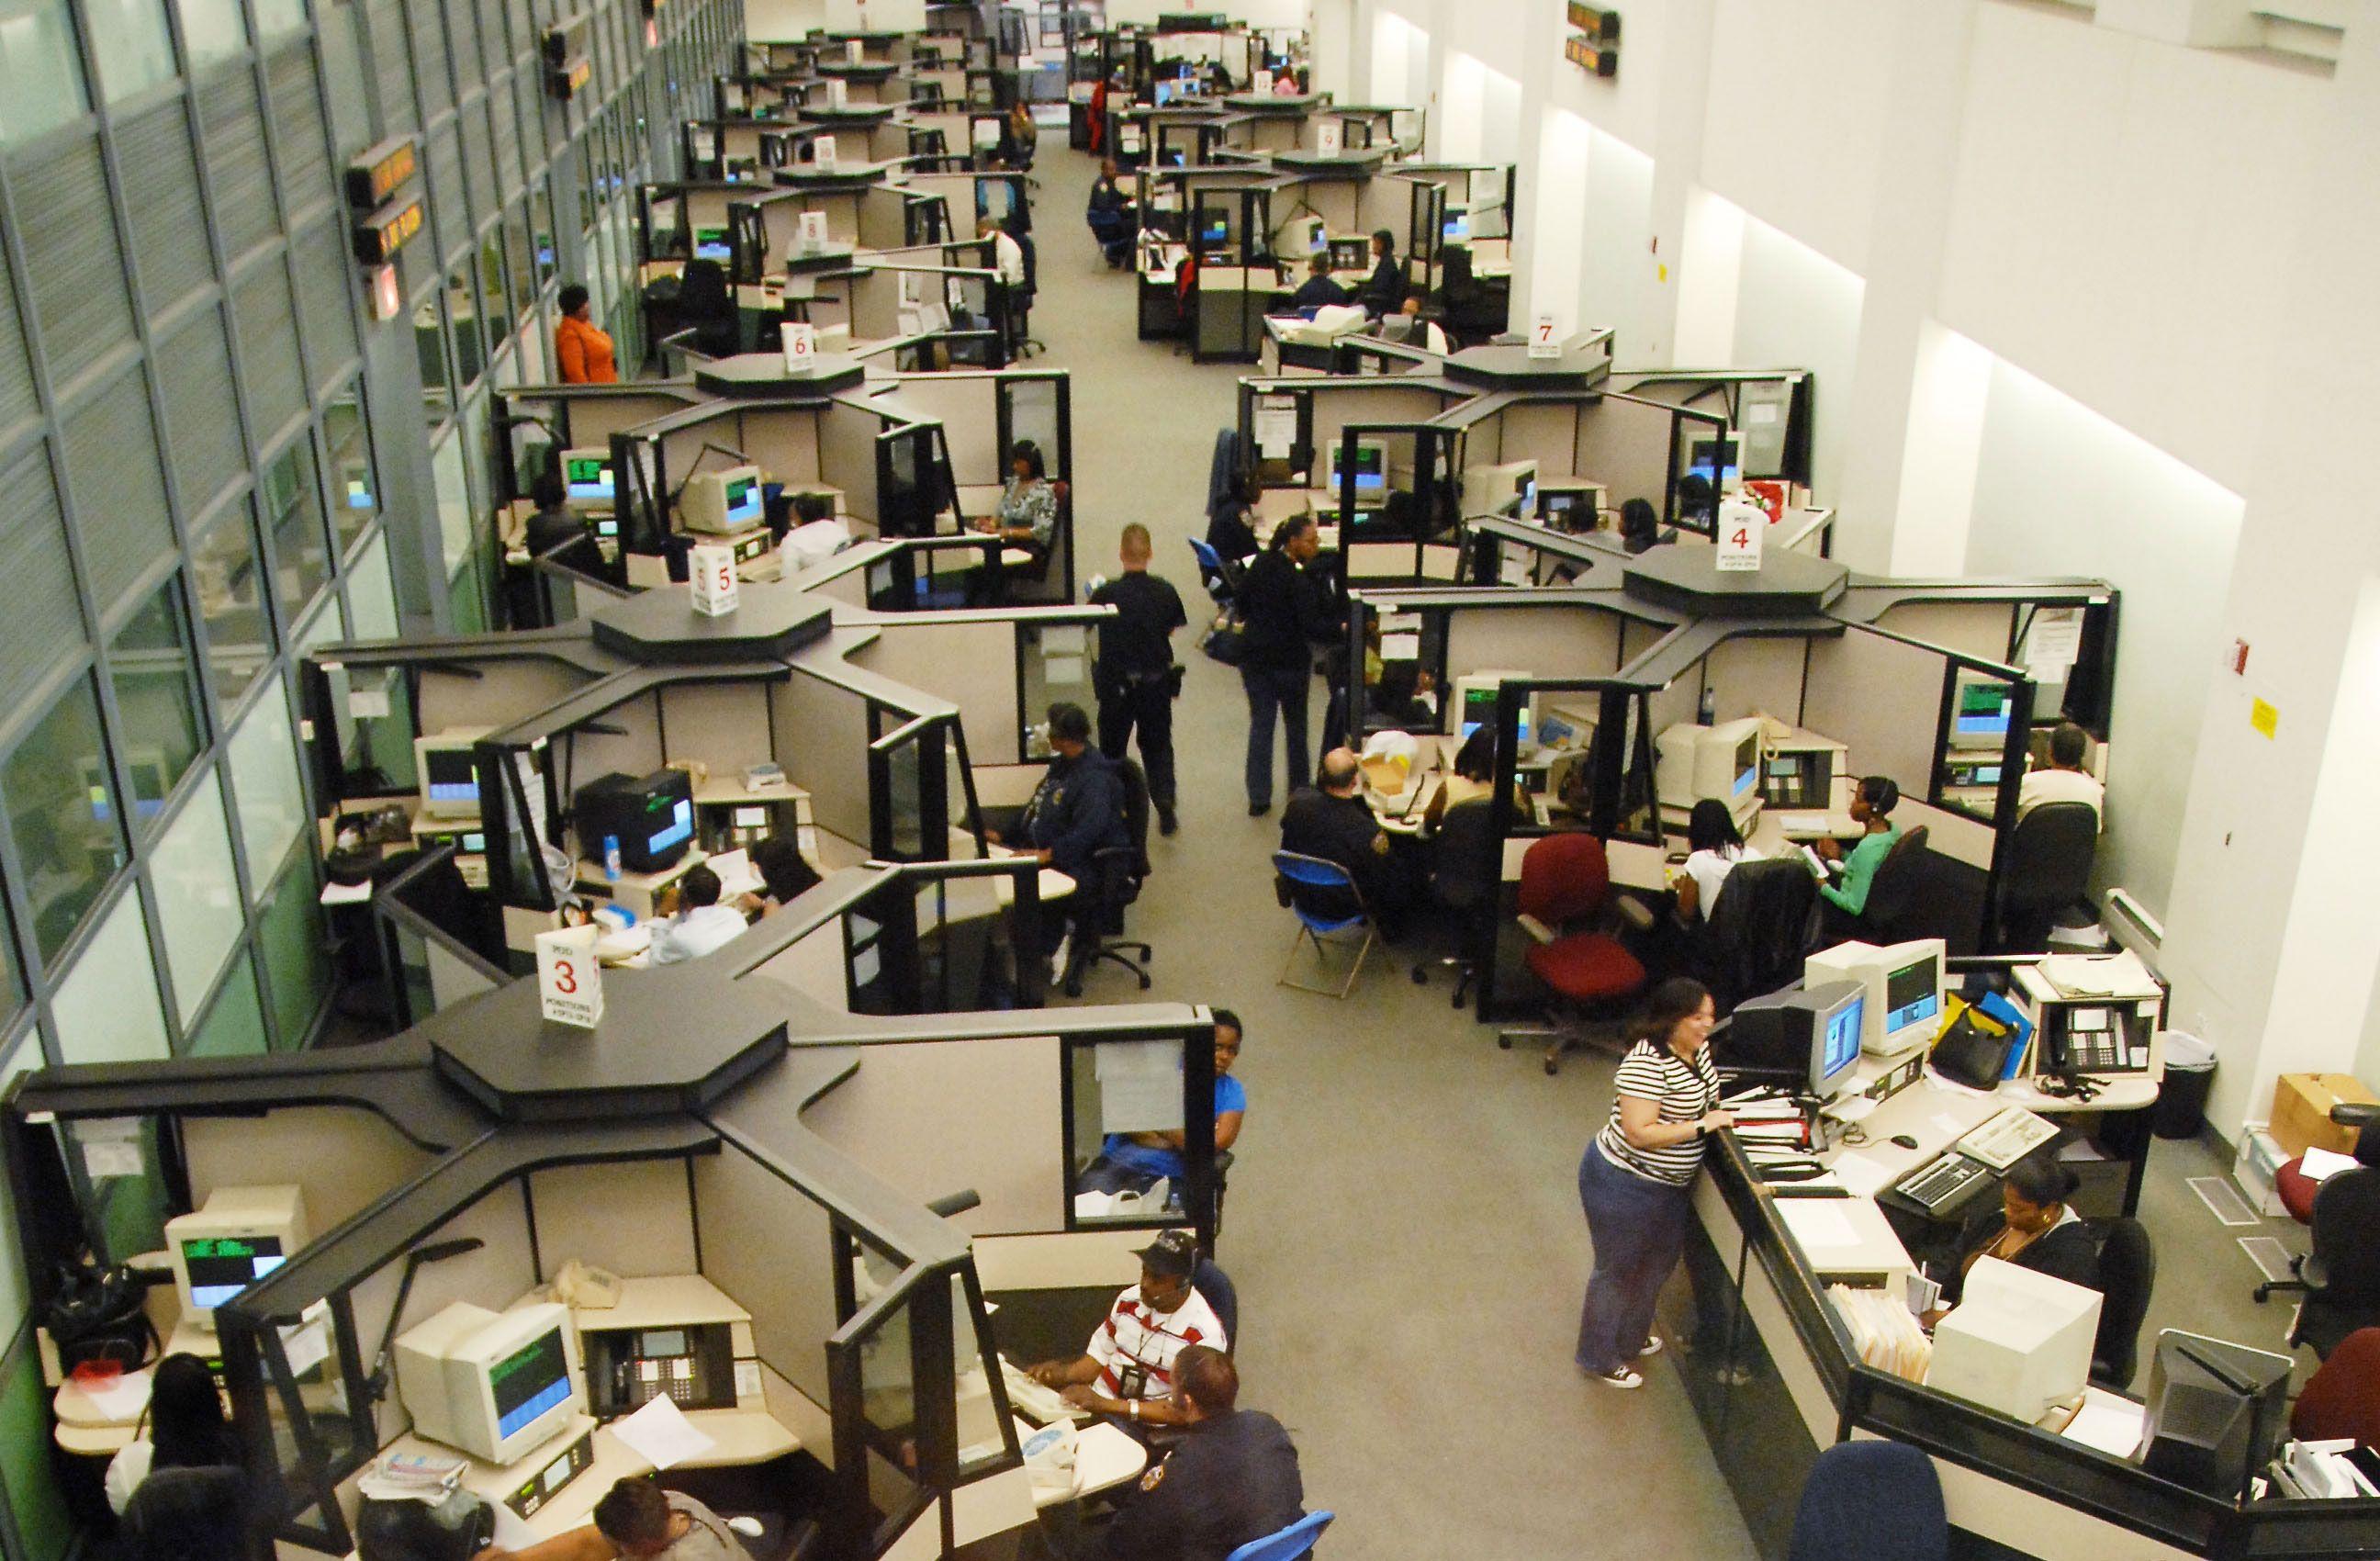 Honey comb call center furniture callcenterfurniture